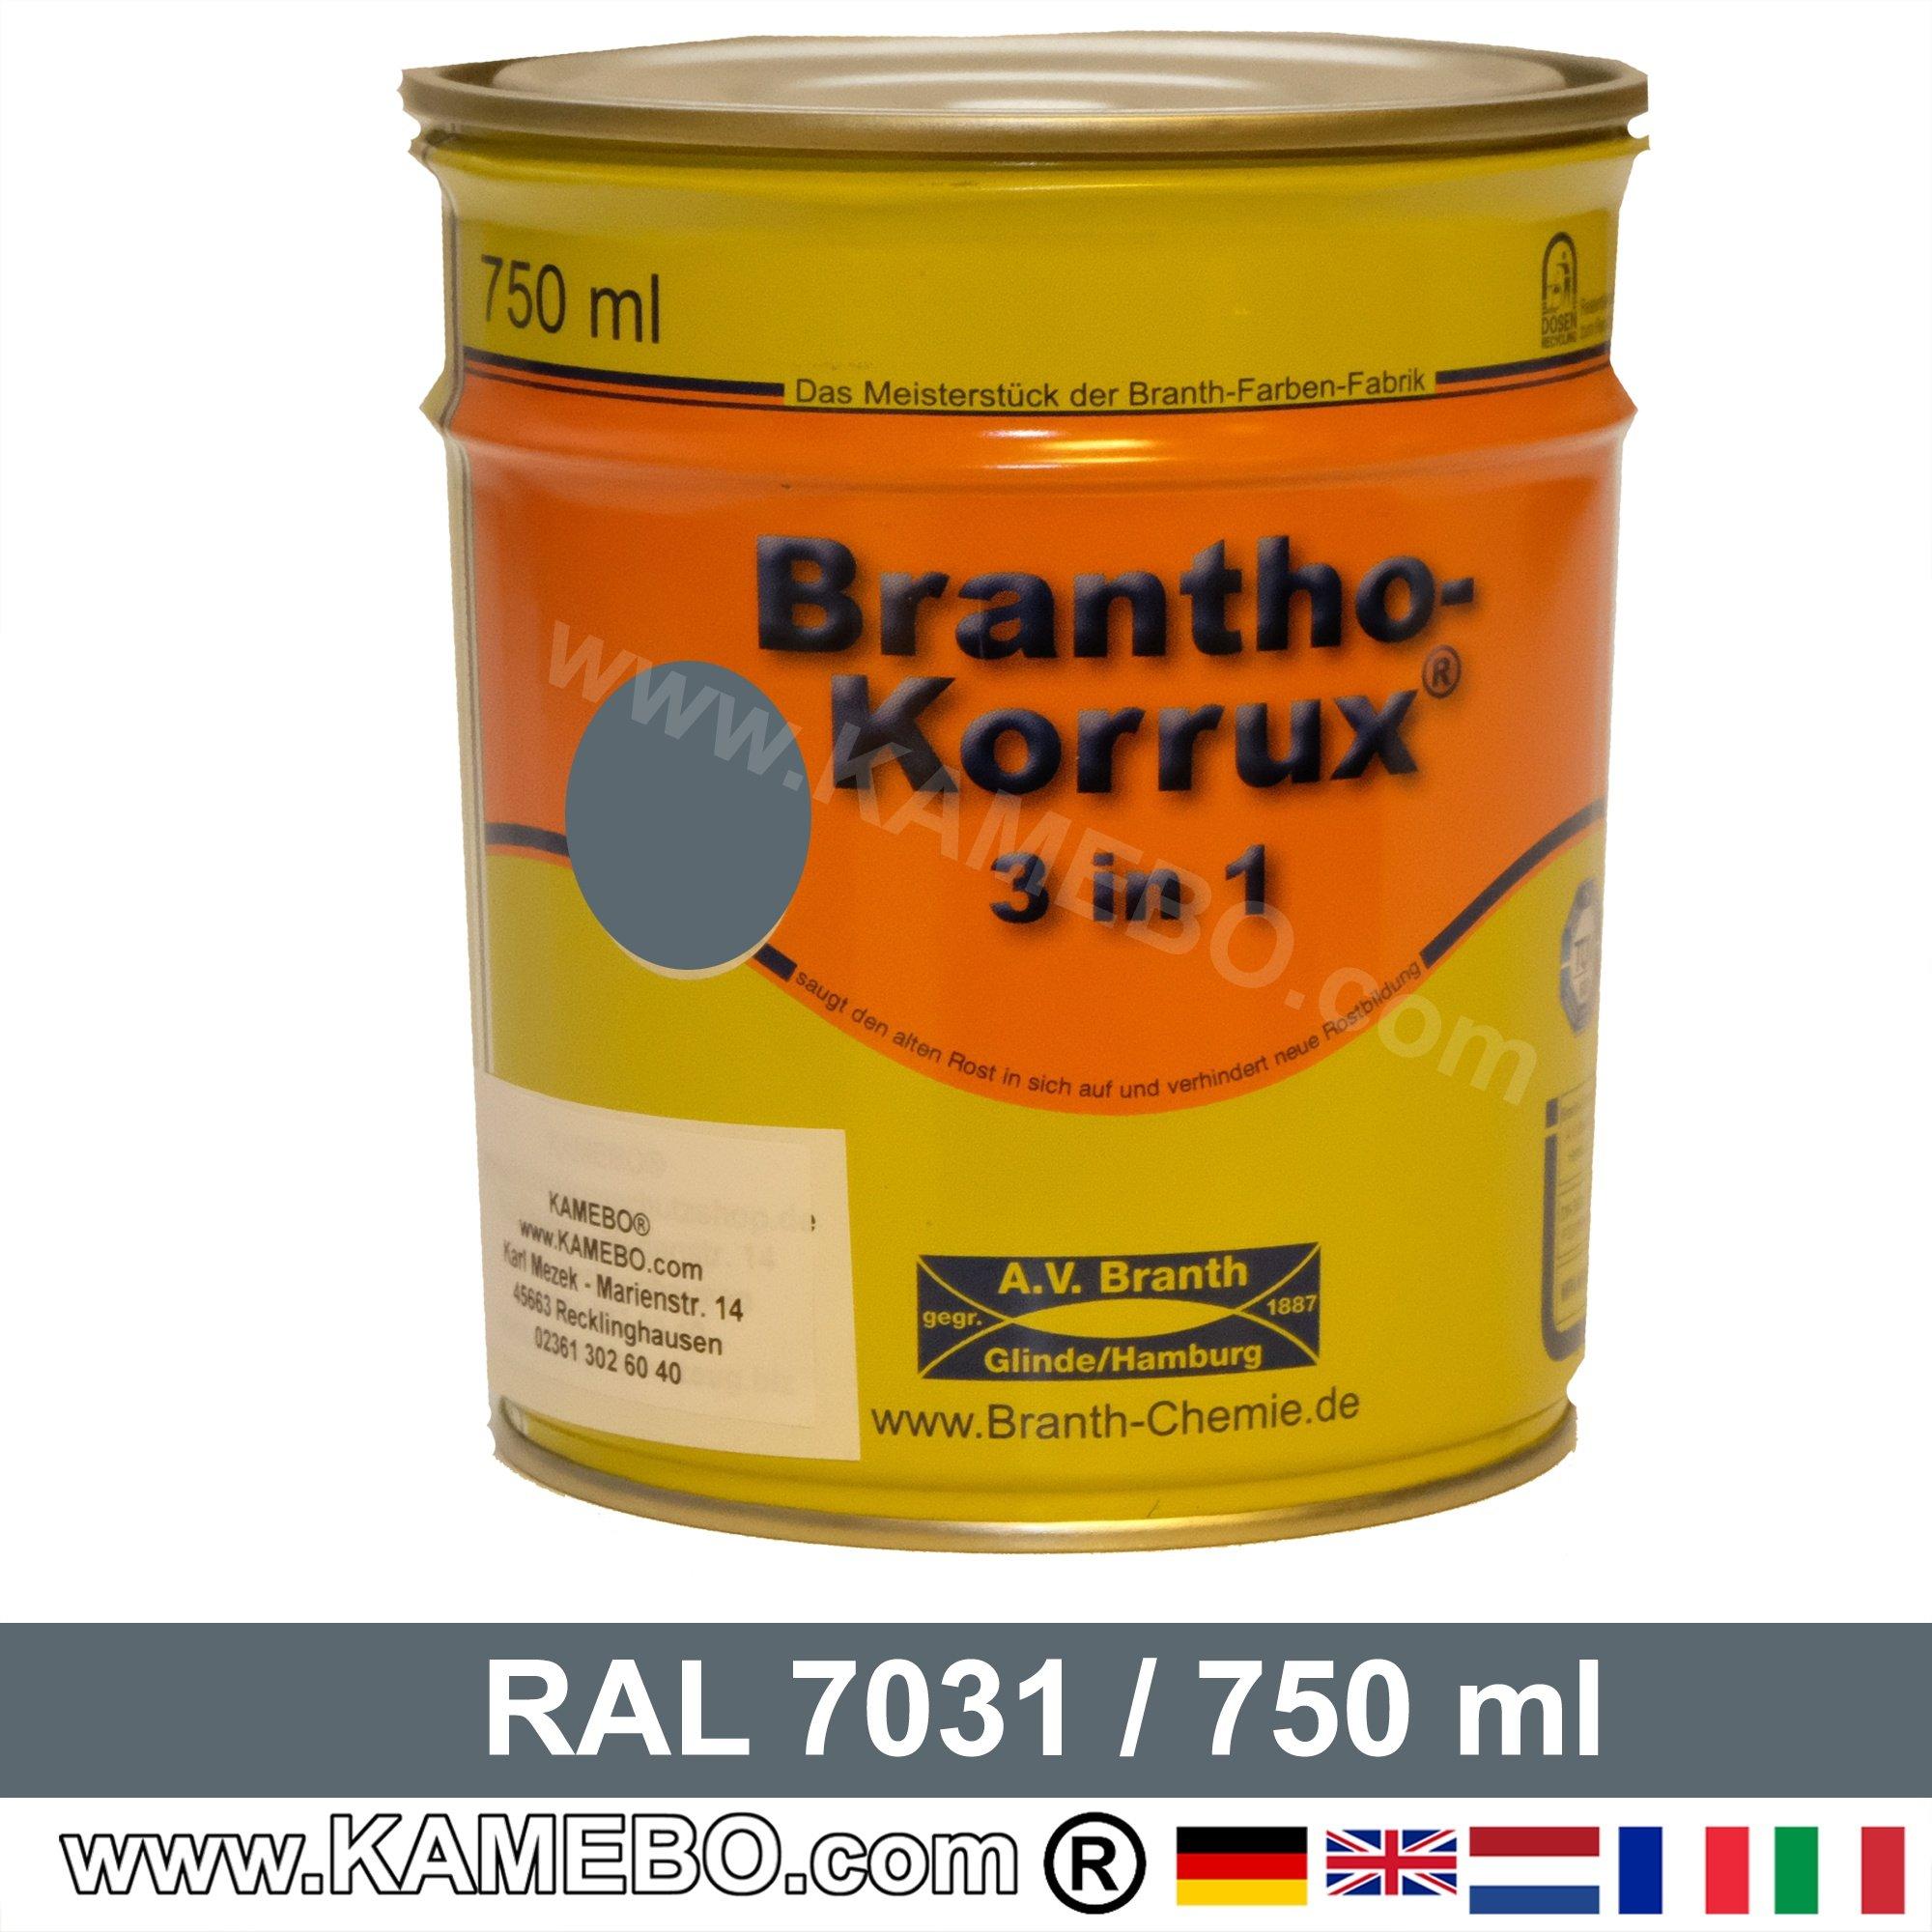 BRANTHO-KORRUX 3in1 Rostschutzlack RAL 7031 Blaugrau 750 Ml